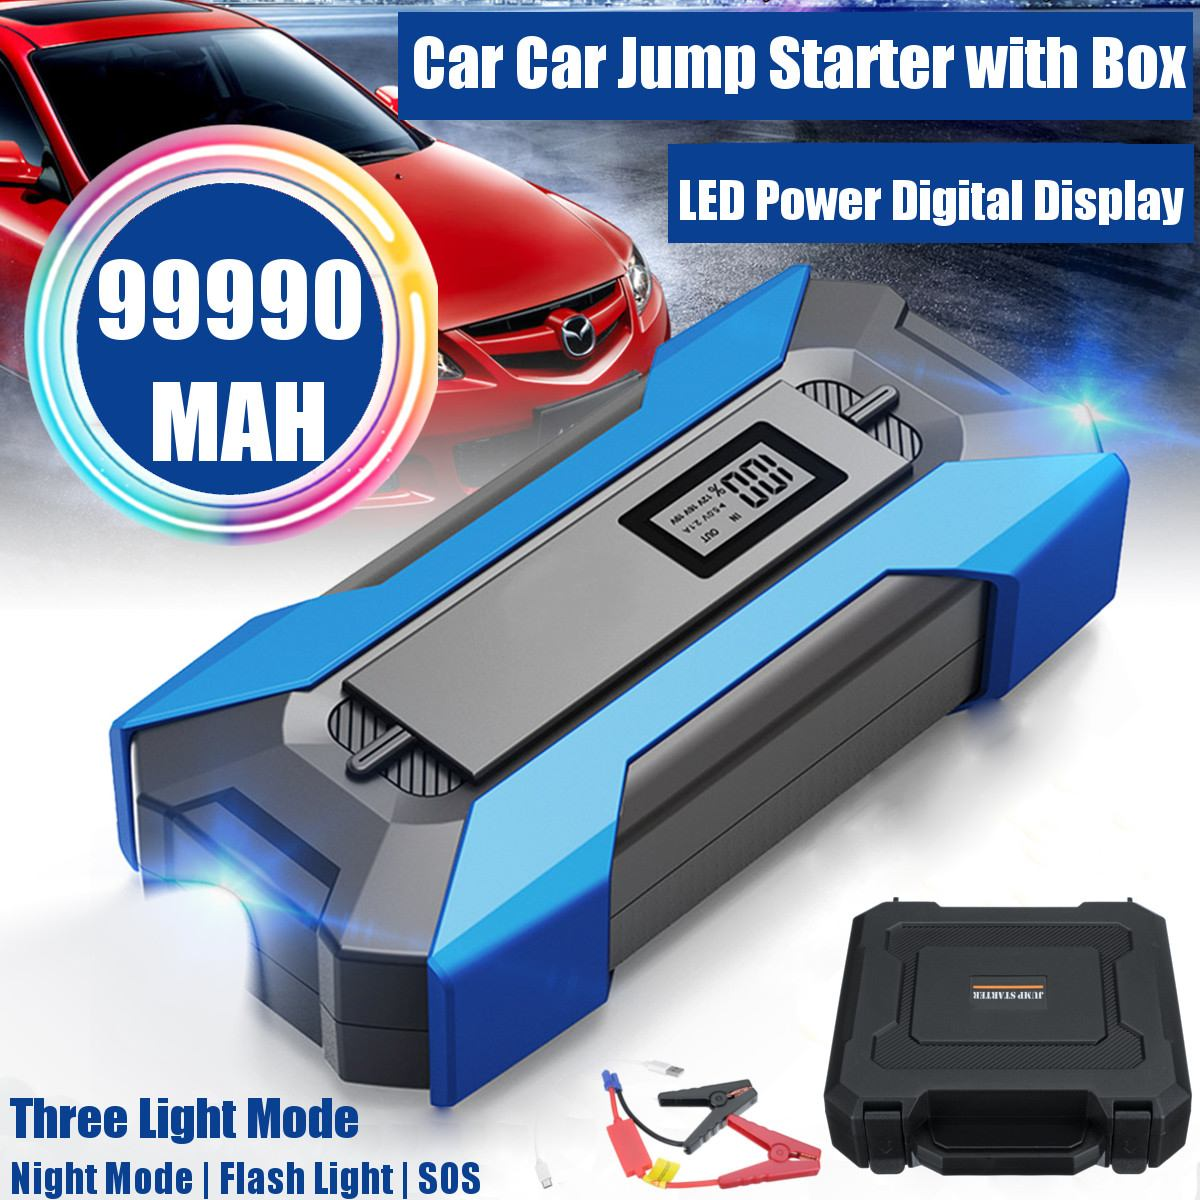 99990mAh 5 Ports Car Jump Starter Cars Battery Jumper 12V 3.0 Fast Charger 3 USB 2 Type-C Emergency Power Bank SOS LED Flashlig